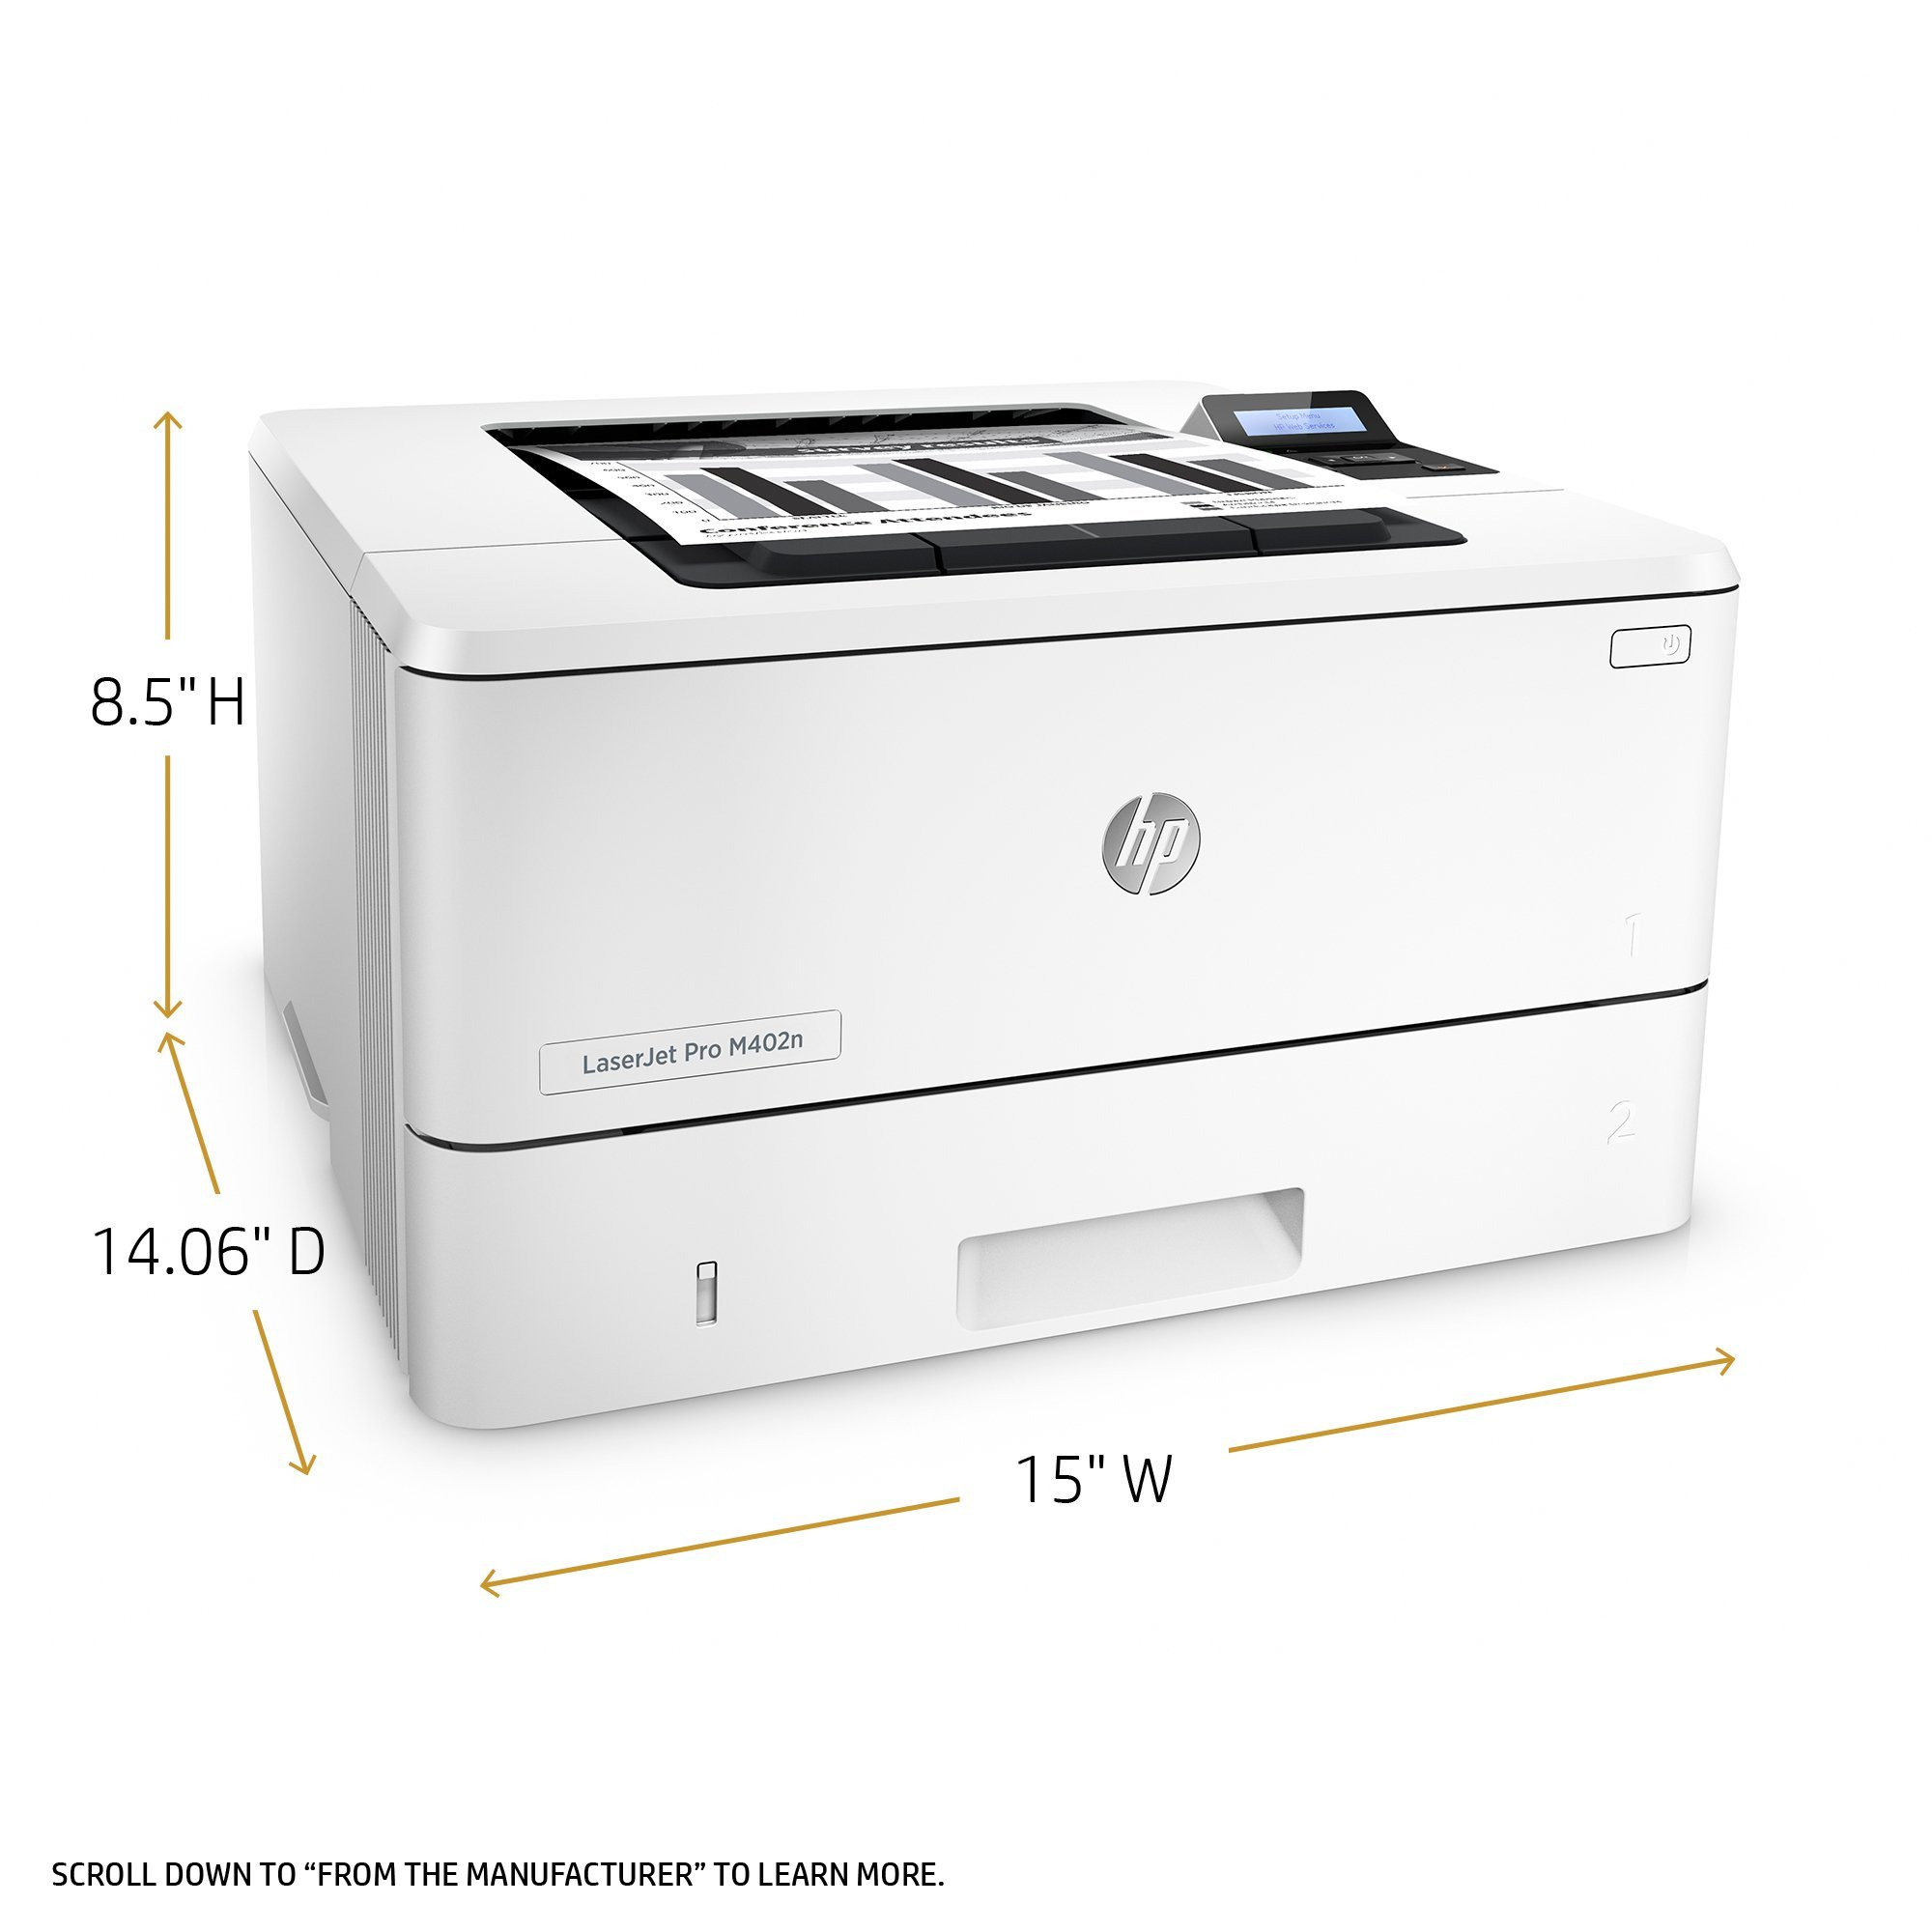 HP Laserjet Pro M402n Monochrome Printer, (C5F93A) (Renewed) by HP (Image #3)